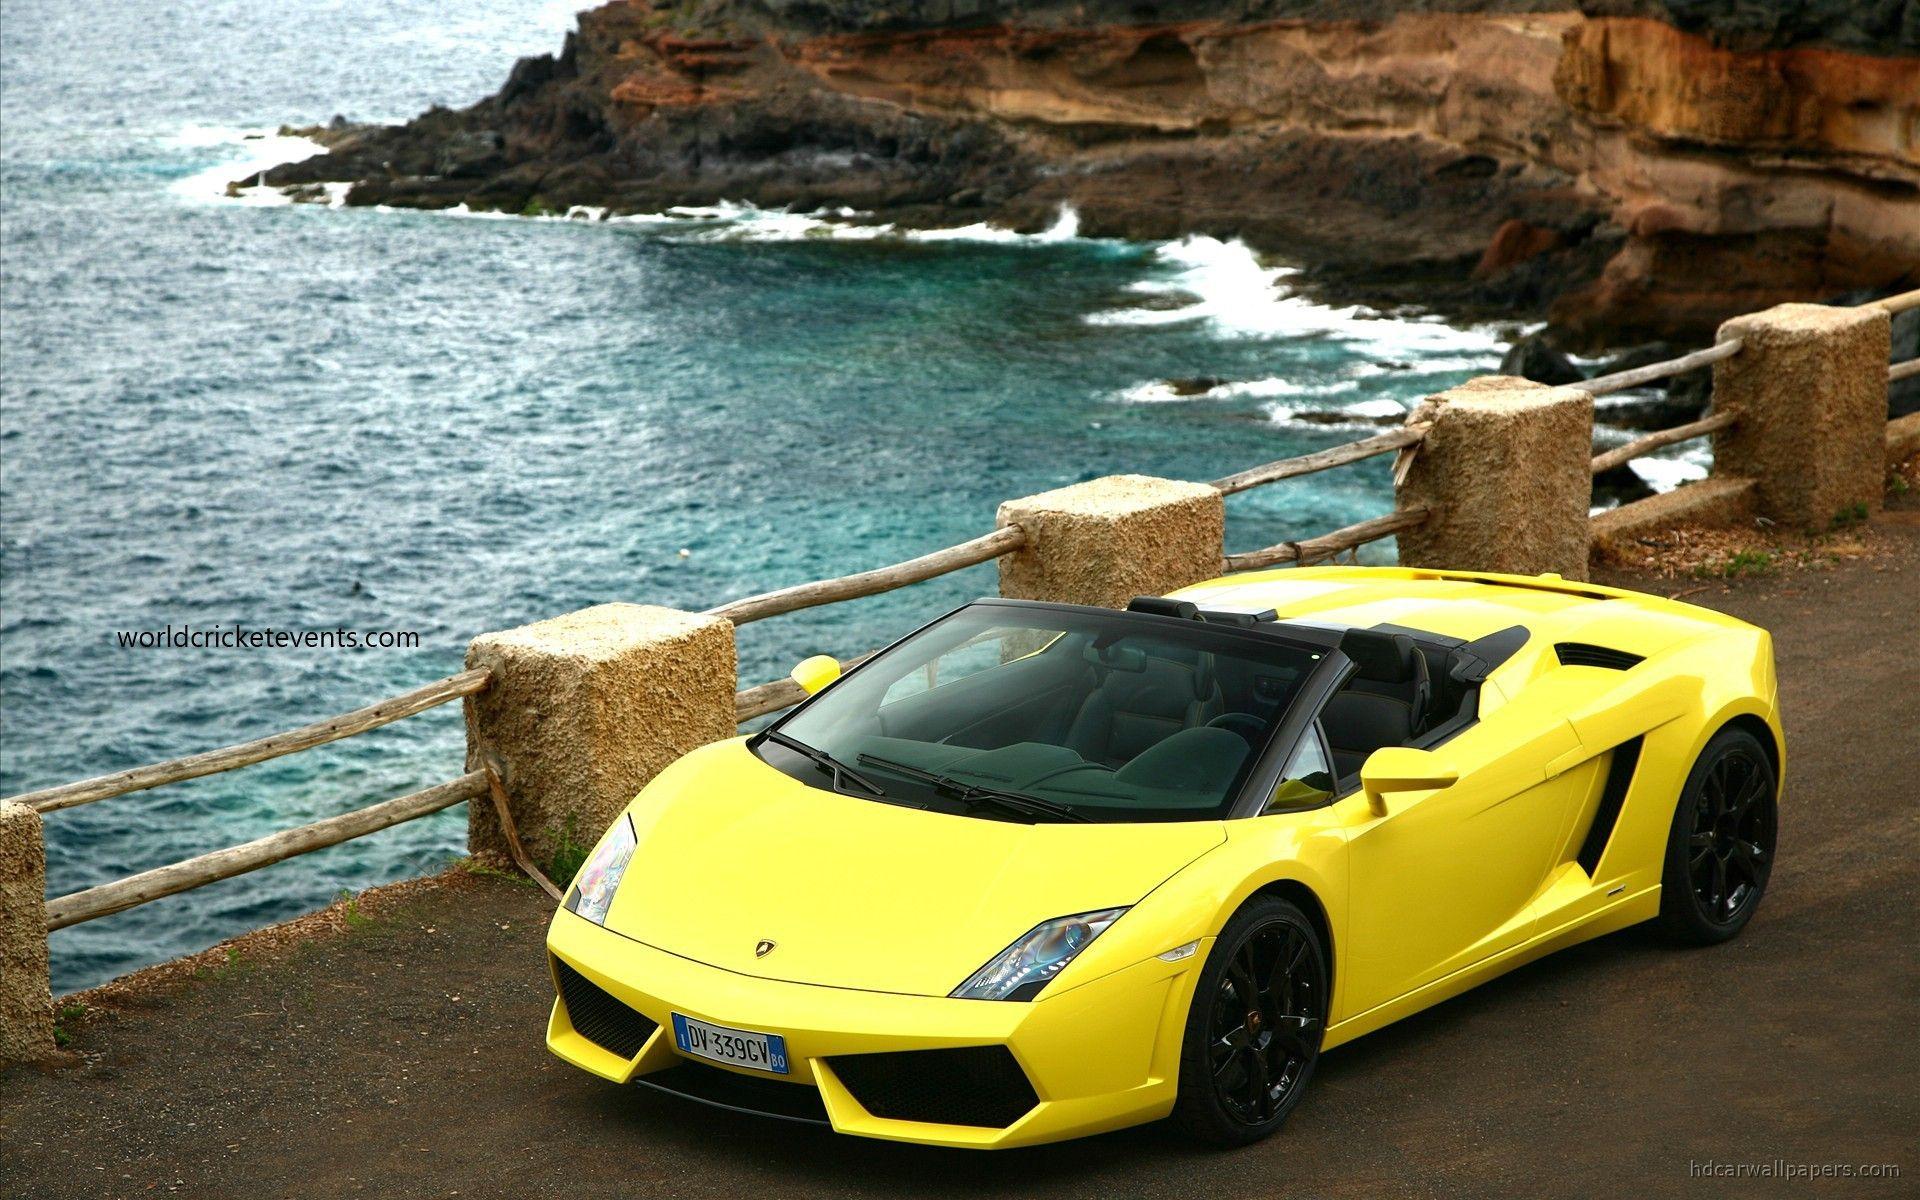 Lamborghini Full Hd Wallpapers Worldcricketevents Free Download